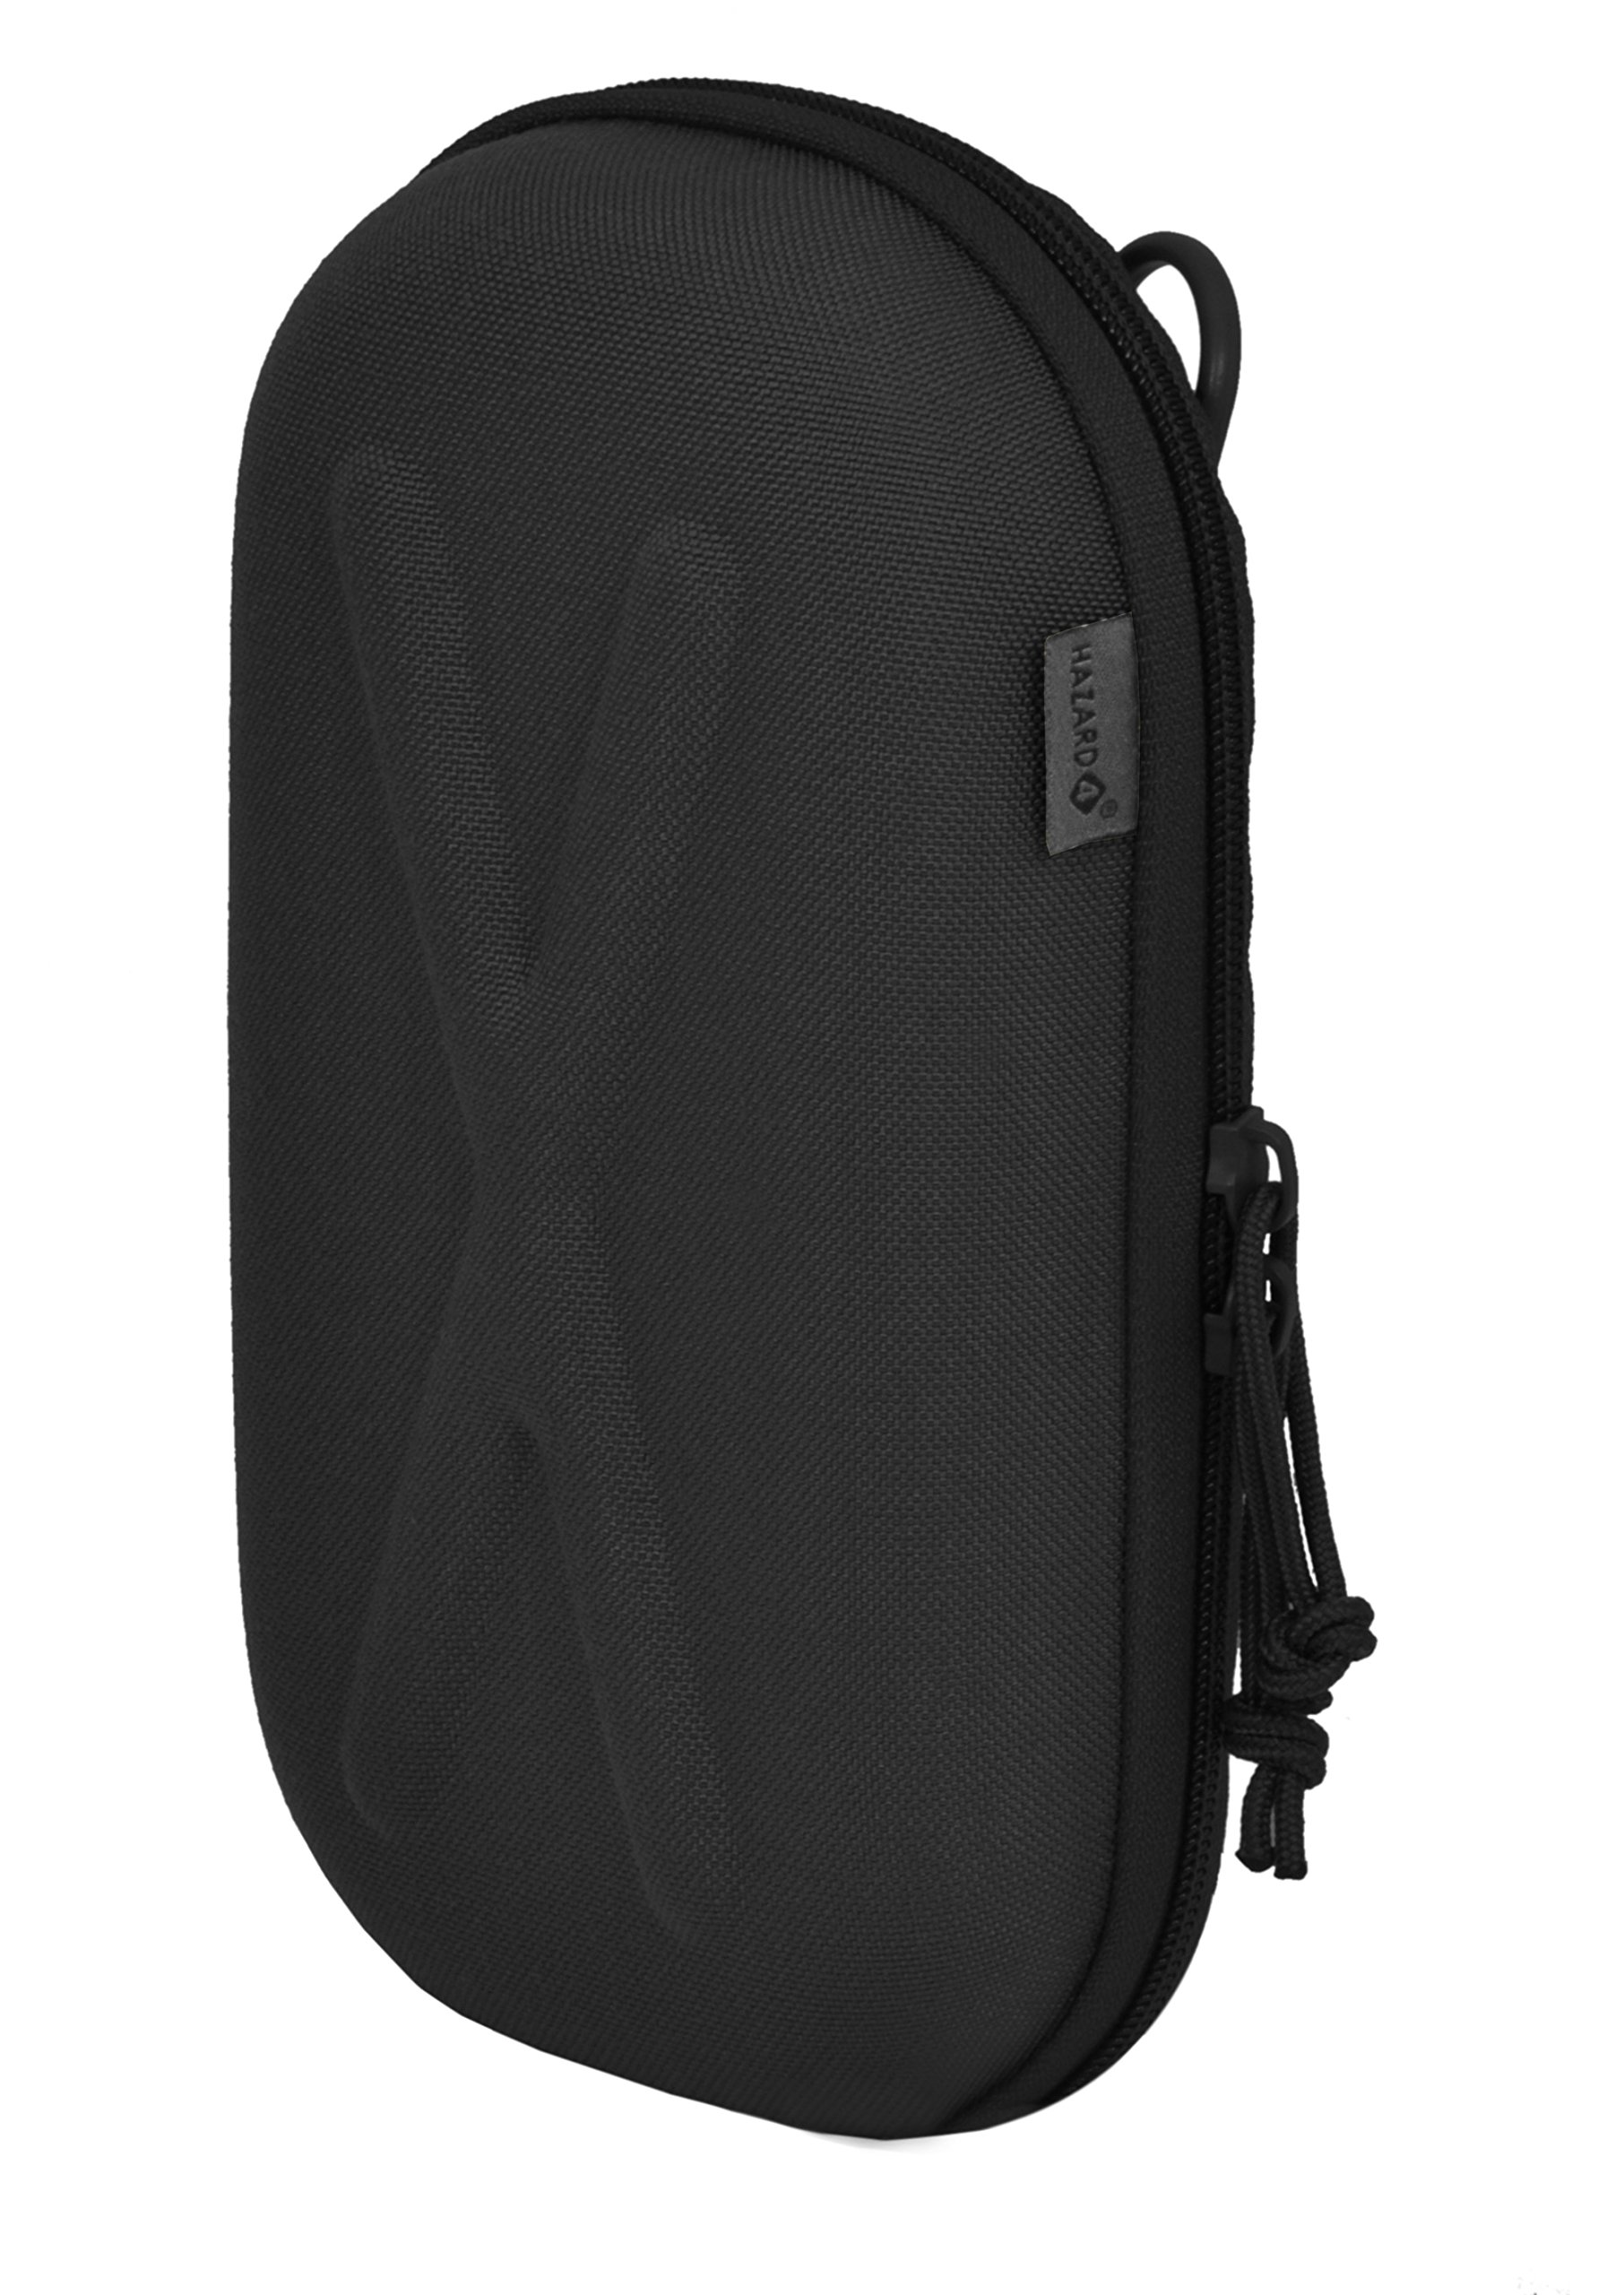 HAZARD 4 Reveille(TM) Rugged Grooming Kit Heavy-Duty Toiletry Bag by (R) · HAZARD  4 Hatch MOLLE Hard-Pouch ce18ba5fa4